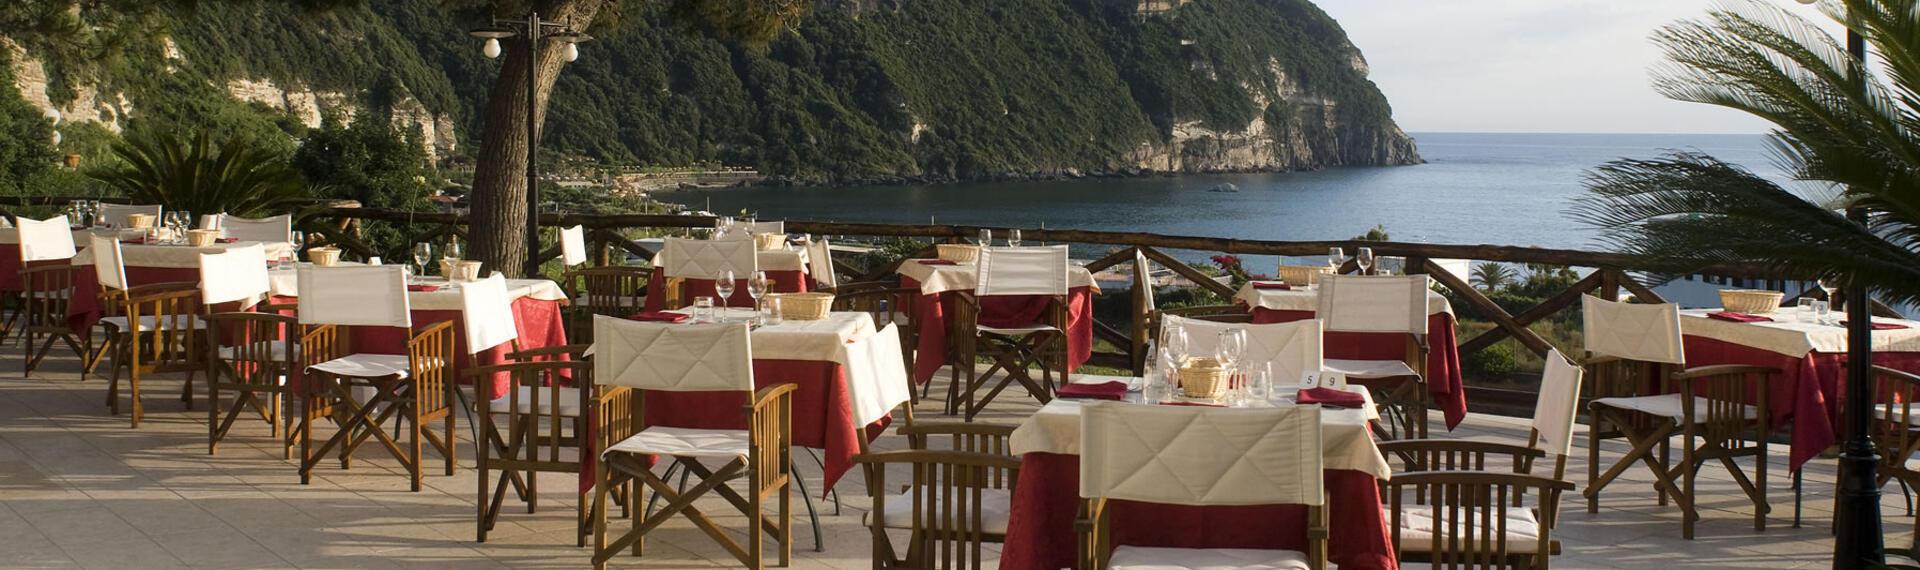 hotelvillabianca it i-ristoranti 009